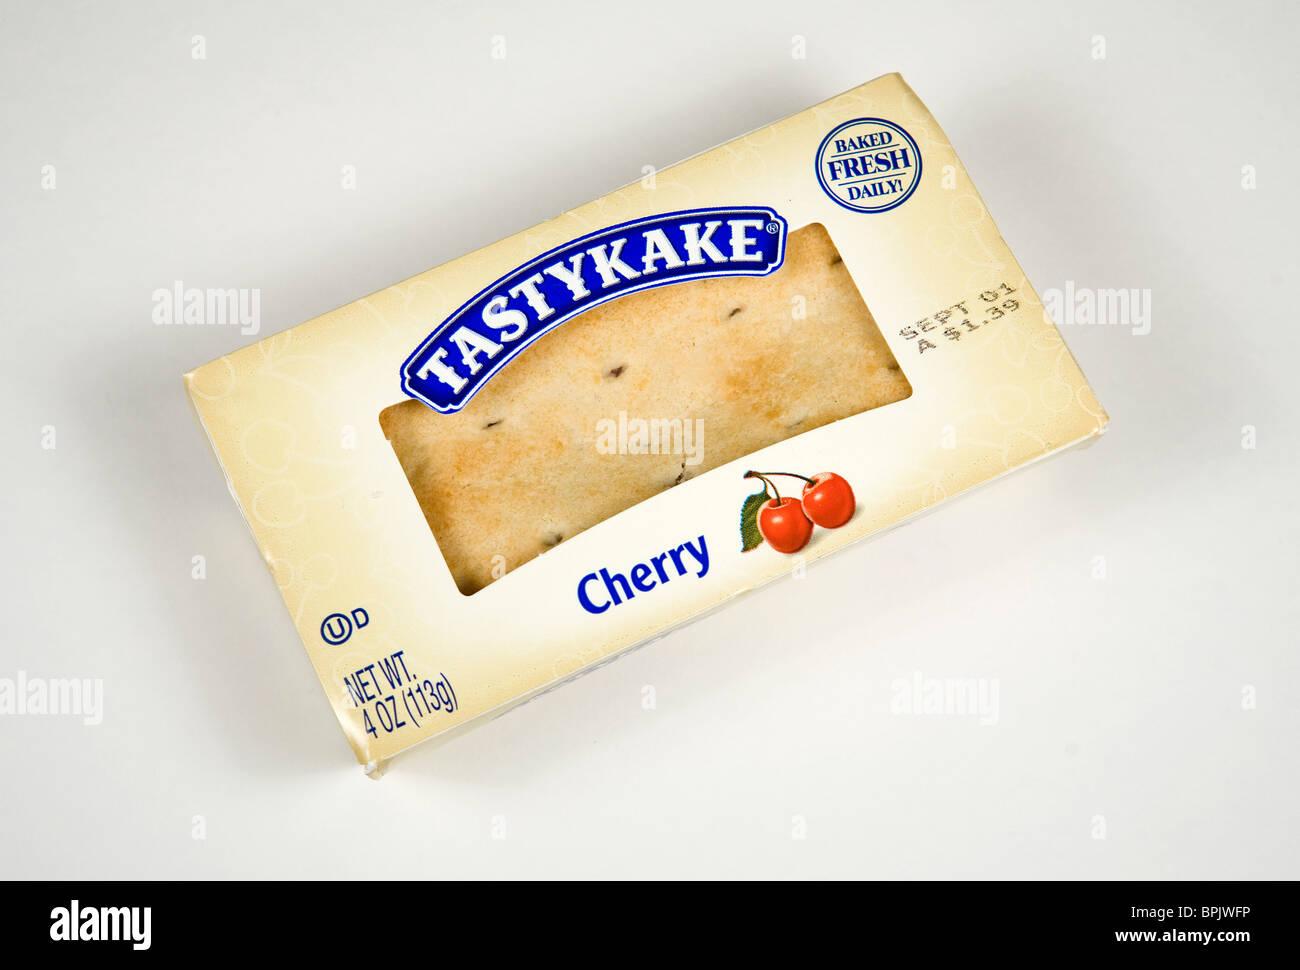 Tastykake cherry fruit pie. - Stock Image